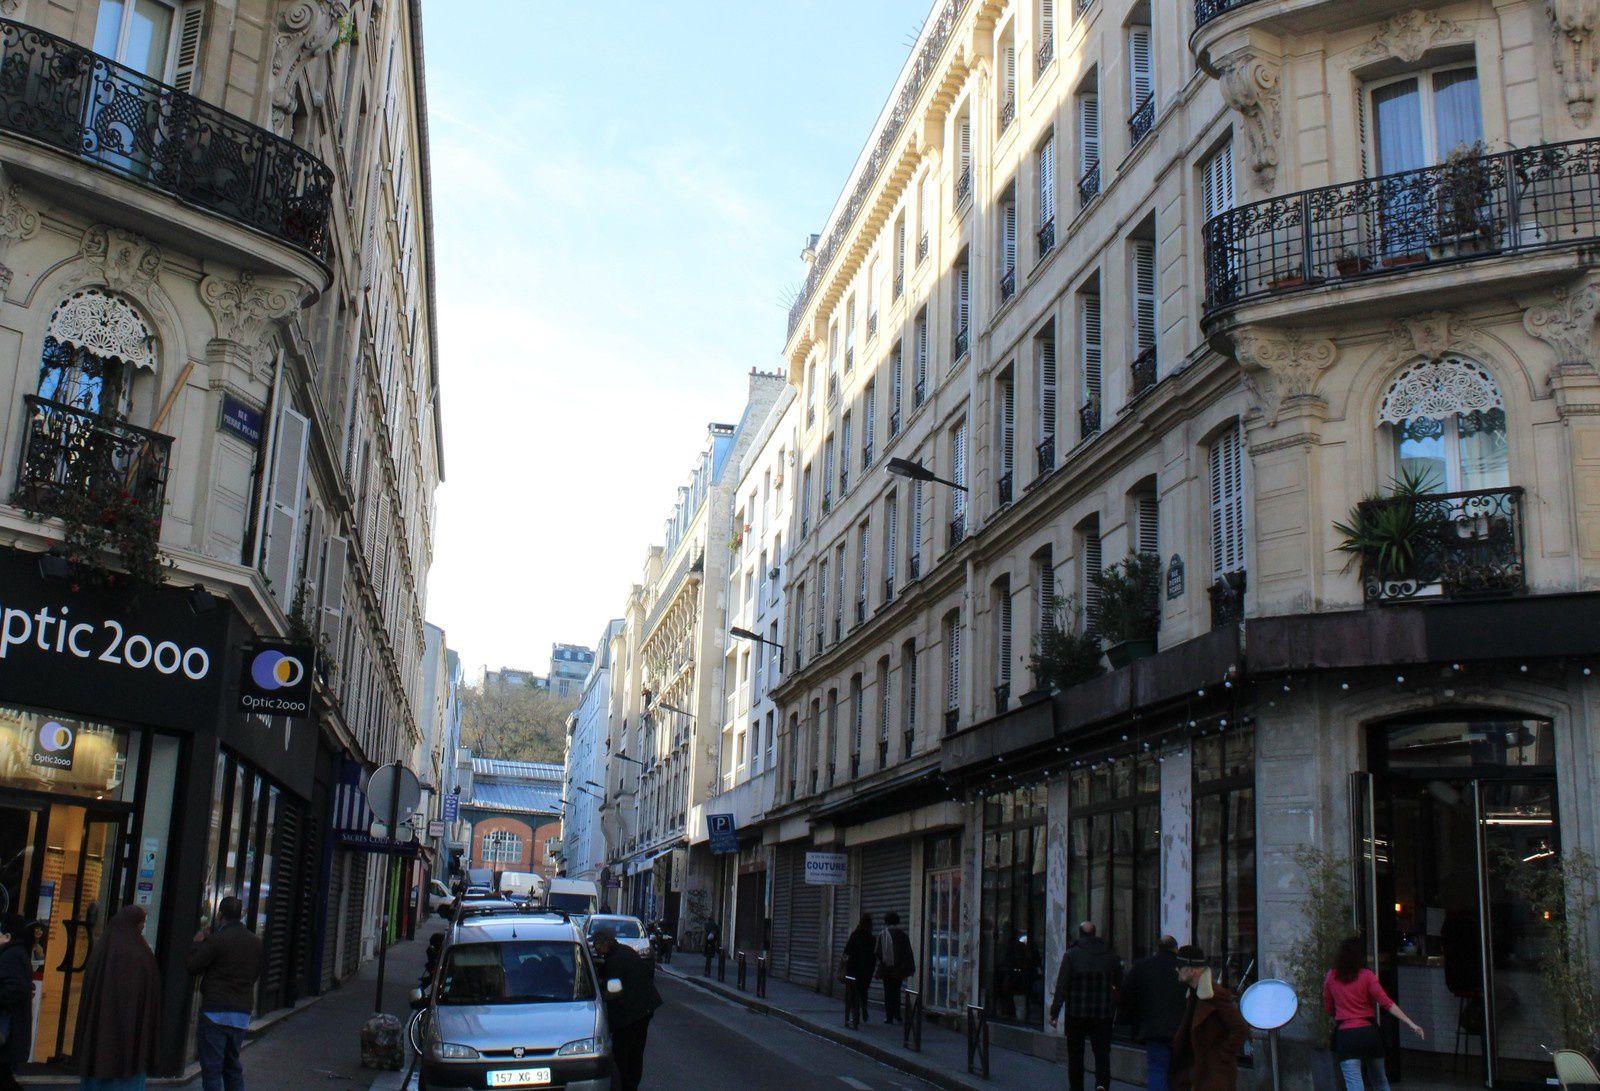 Rue Picard